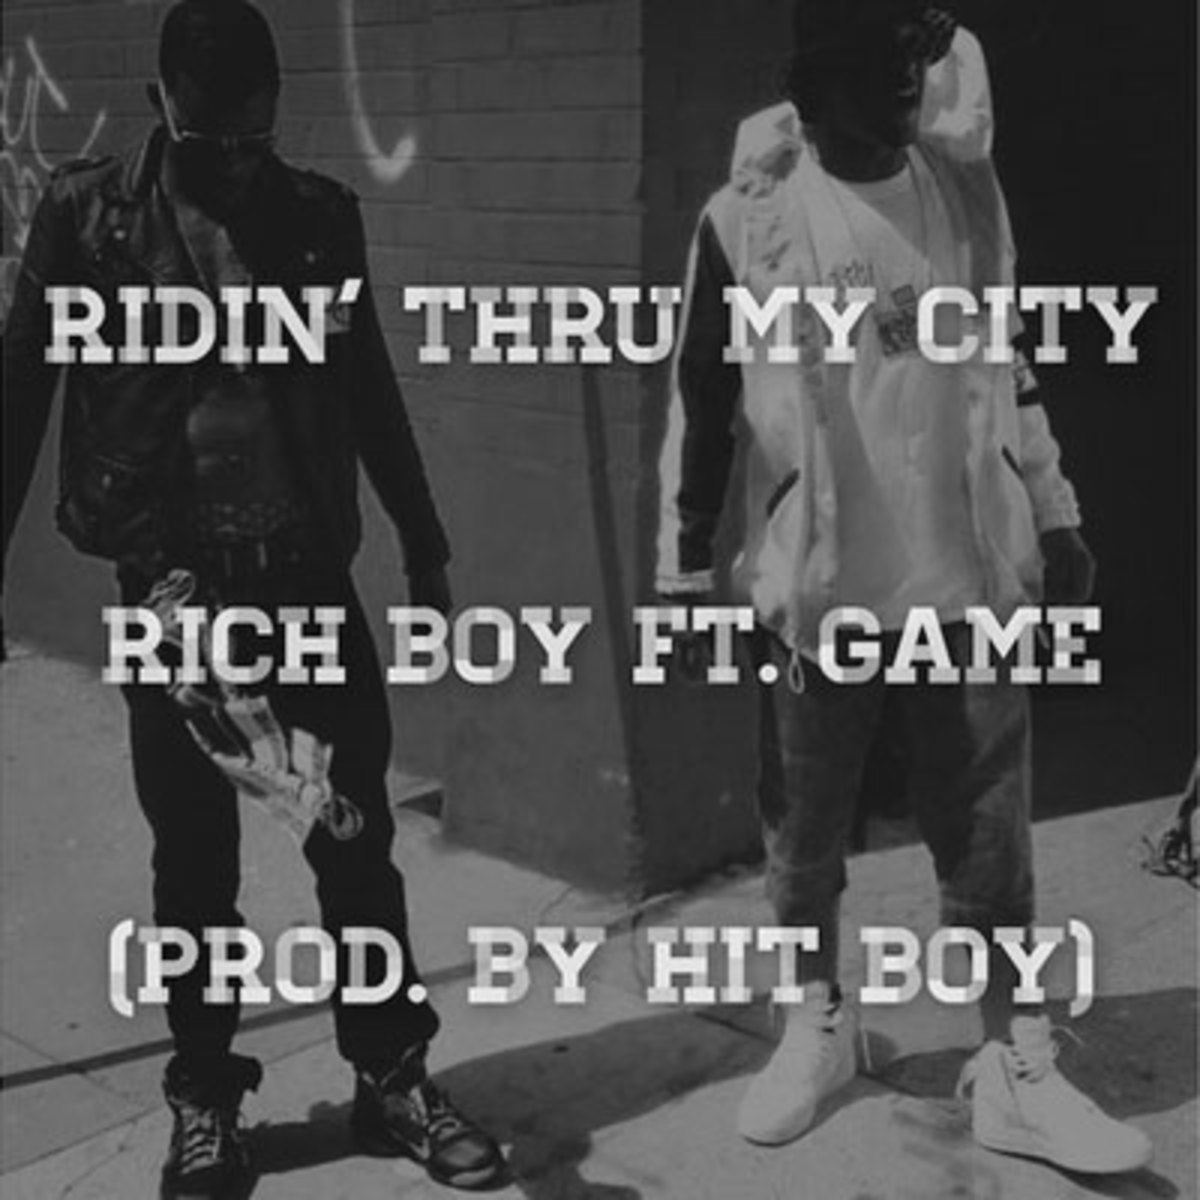 richboy-ridinthru.jpg